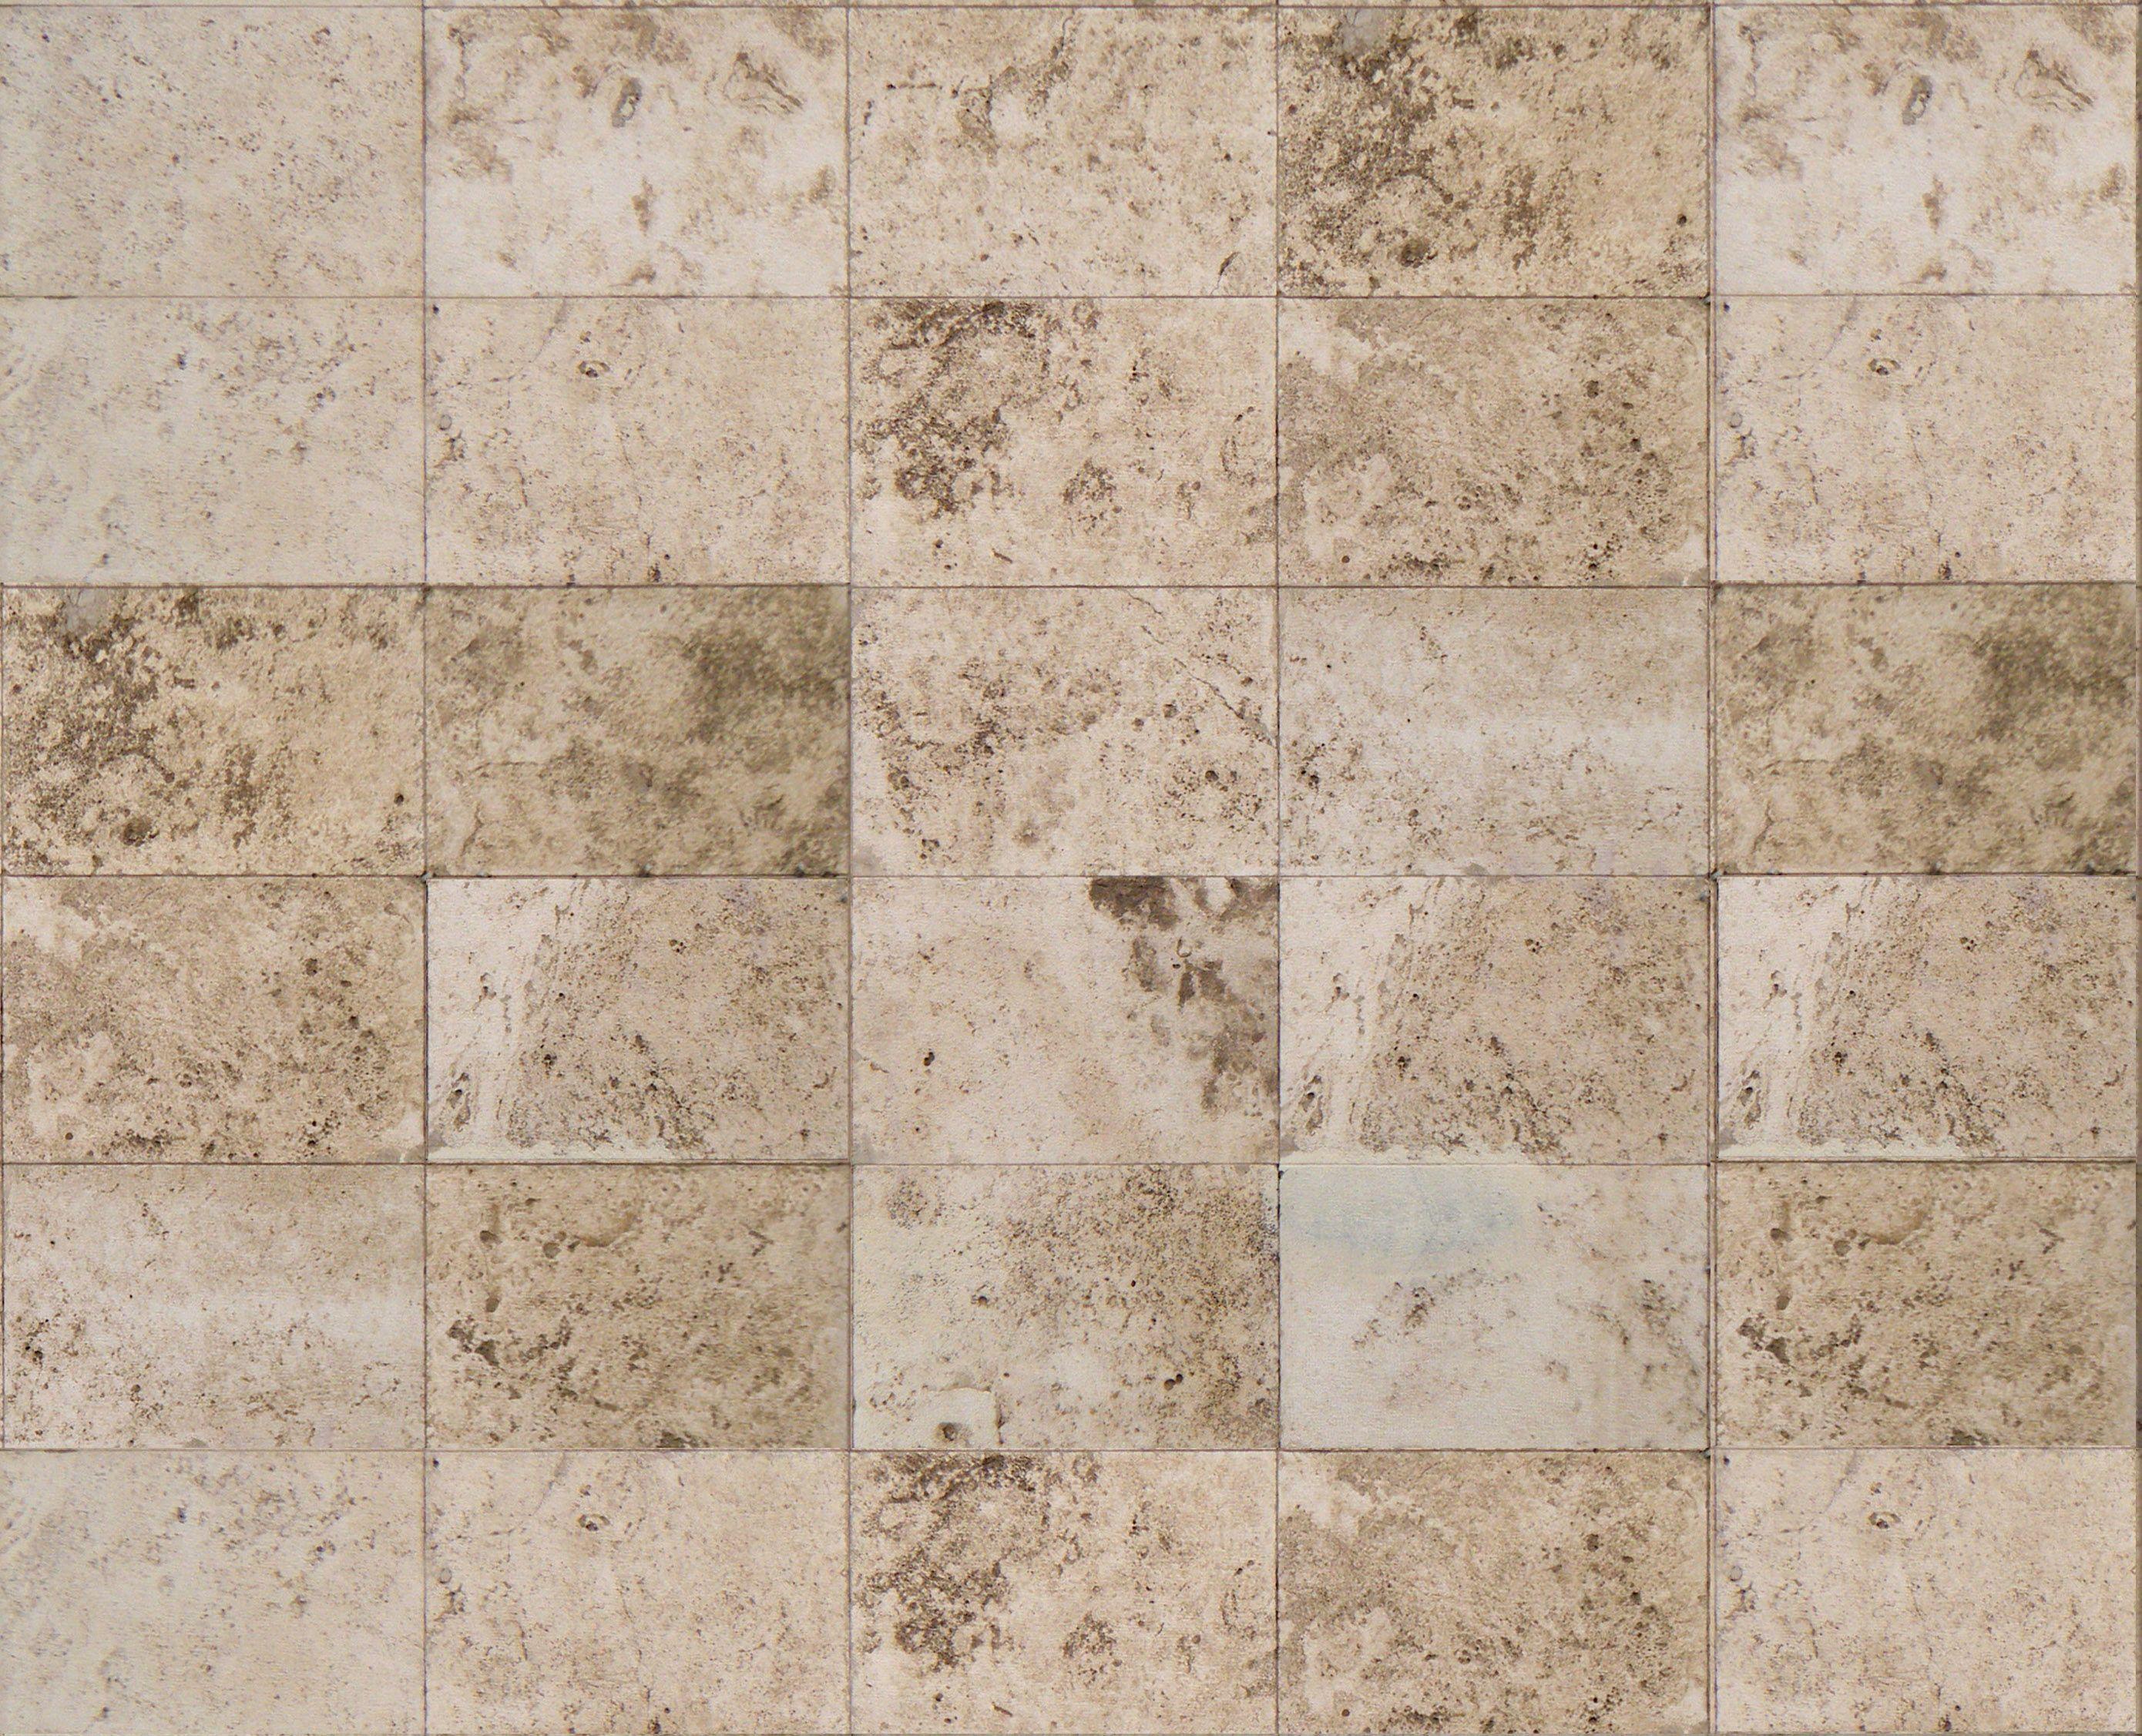 Modern Tile Floor Texture Design Decorating 820106 Floor Ideas